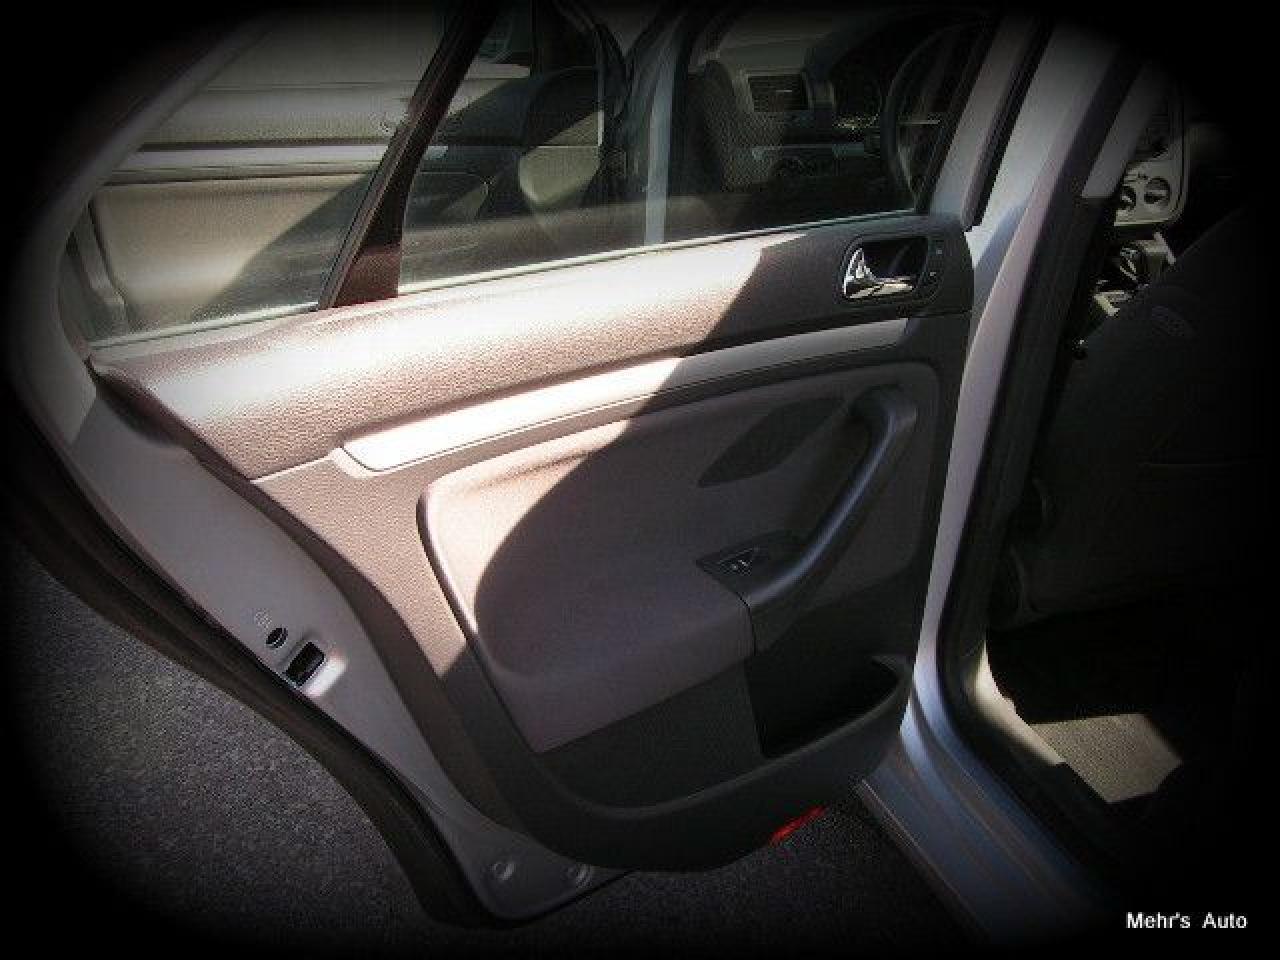 2006 Volkswagen Jetta 2.5L